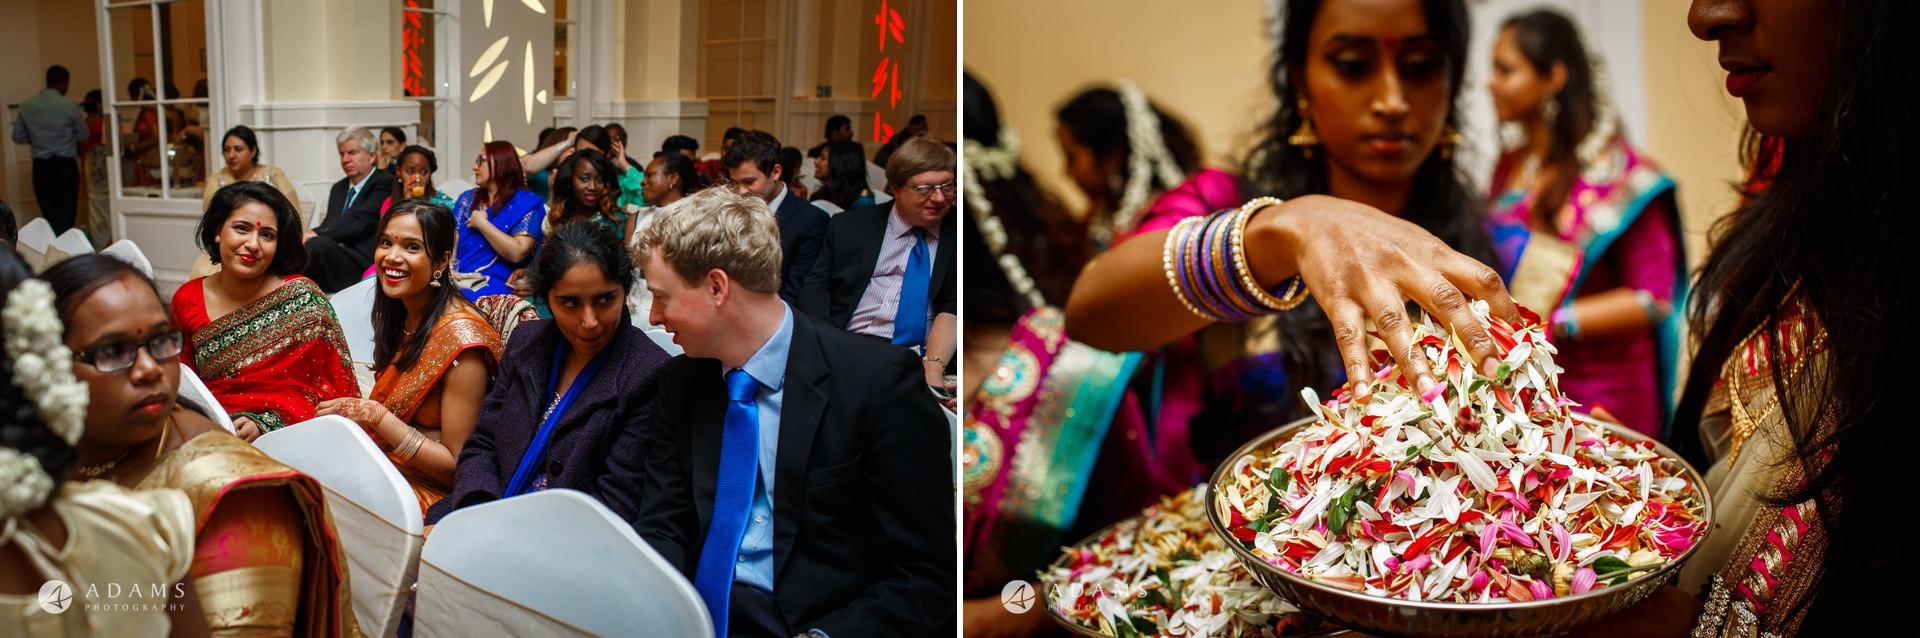 tamil wedding party of sara and anojan